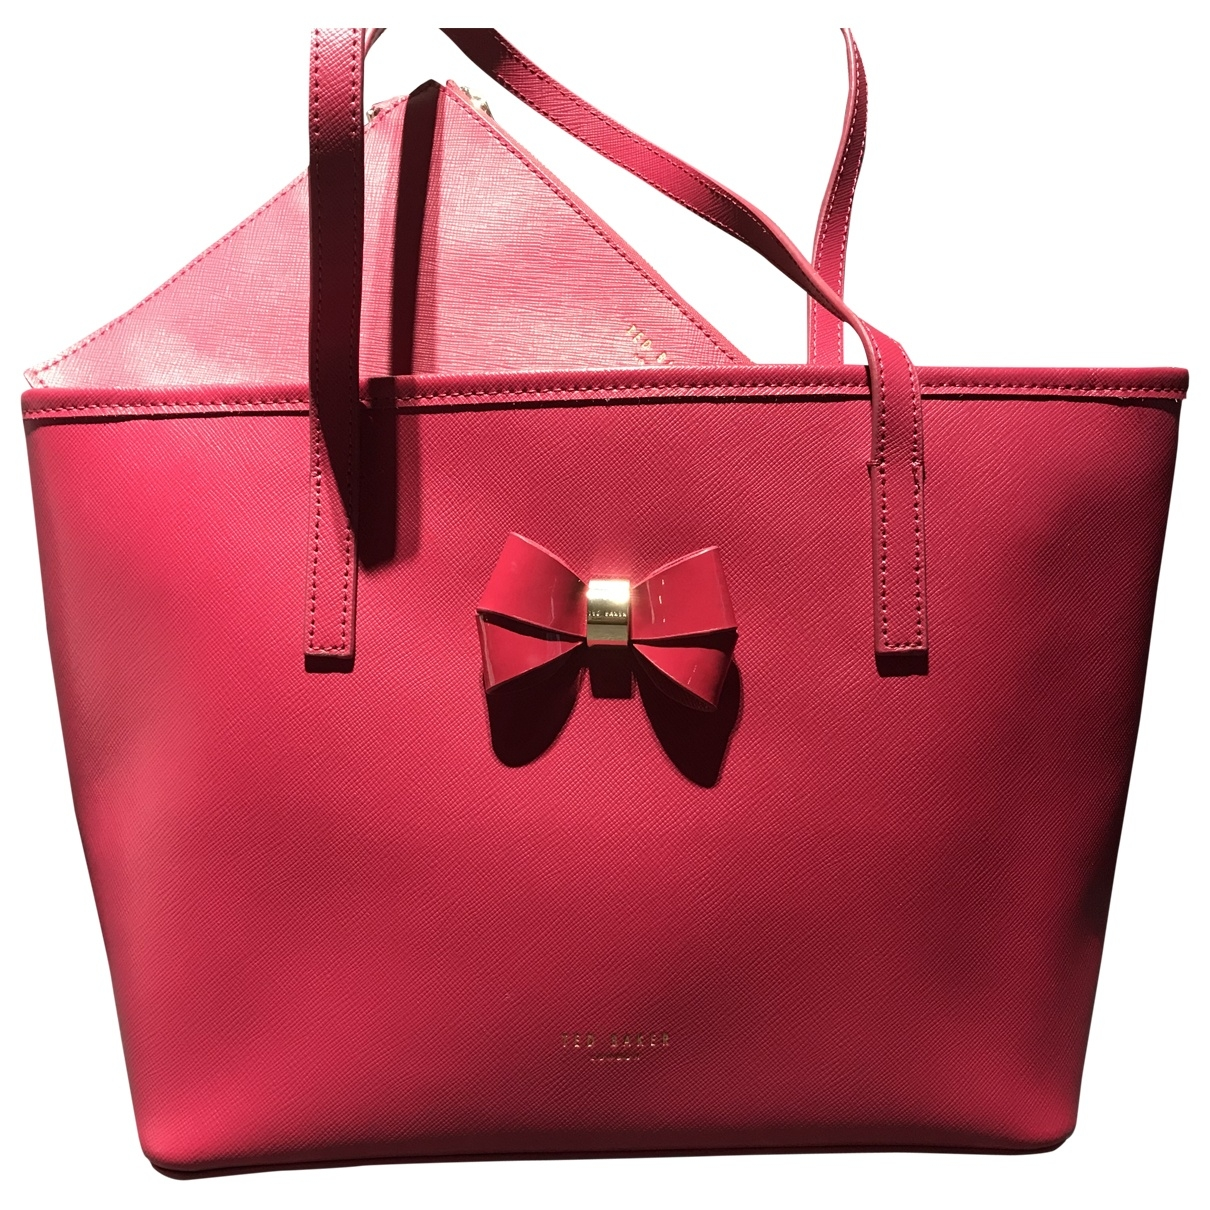 Ted Baker \N Pink Leather handbag for Women \N